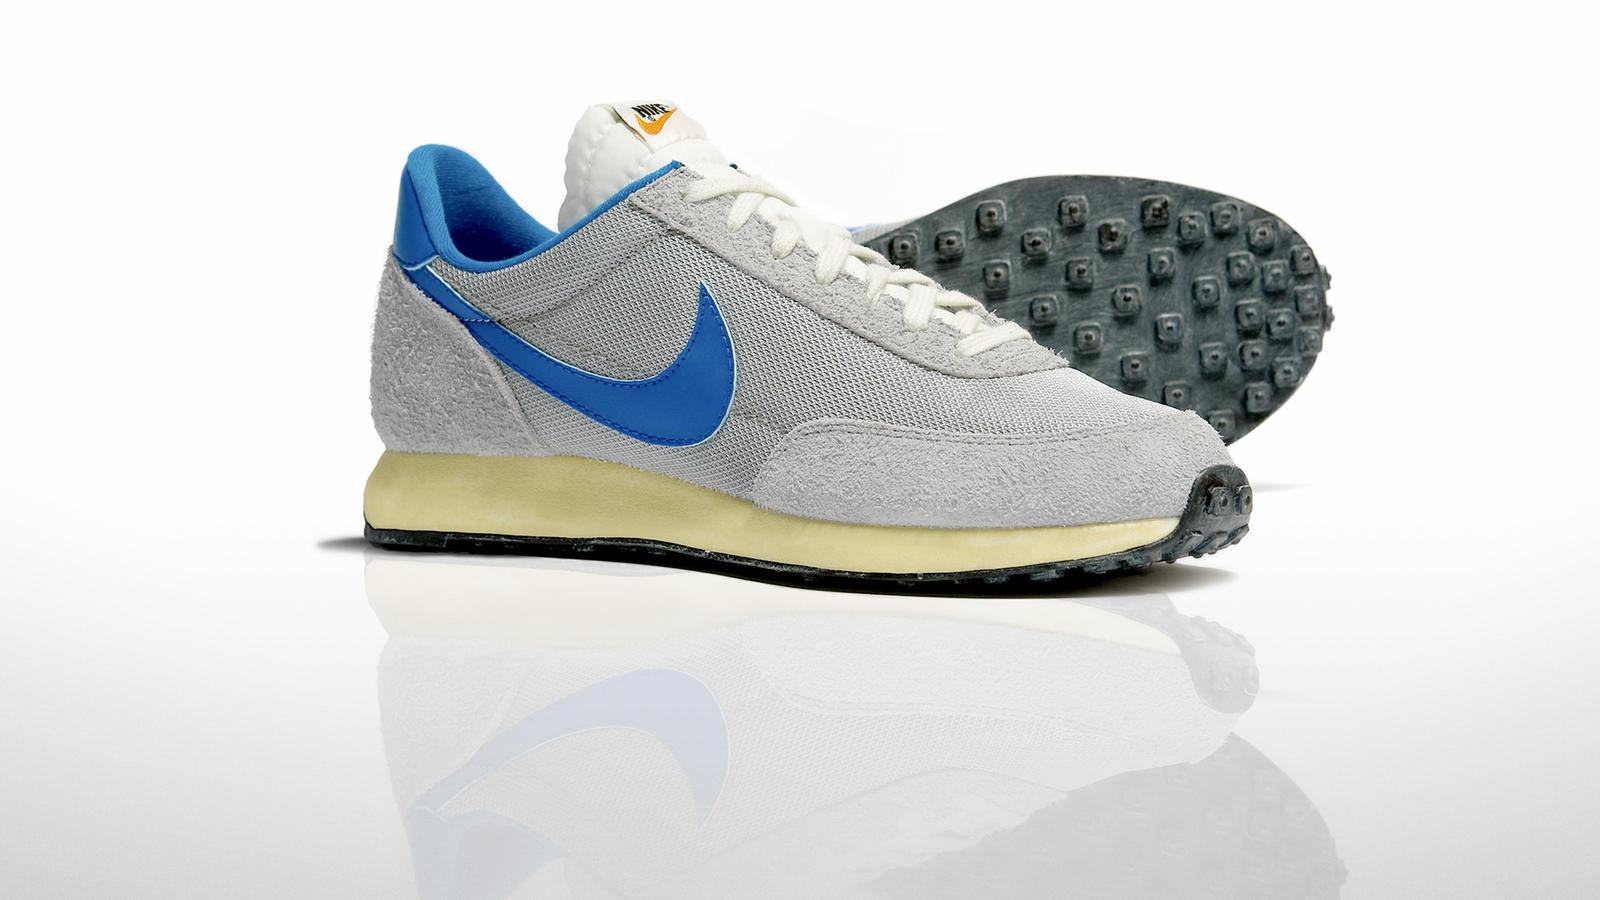 hot sales 82a8b cf5c3 Reintroducing the Nike Tailwind - Nike News